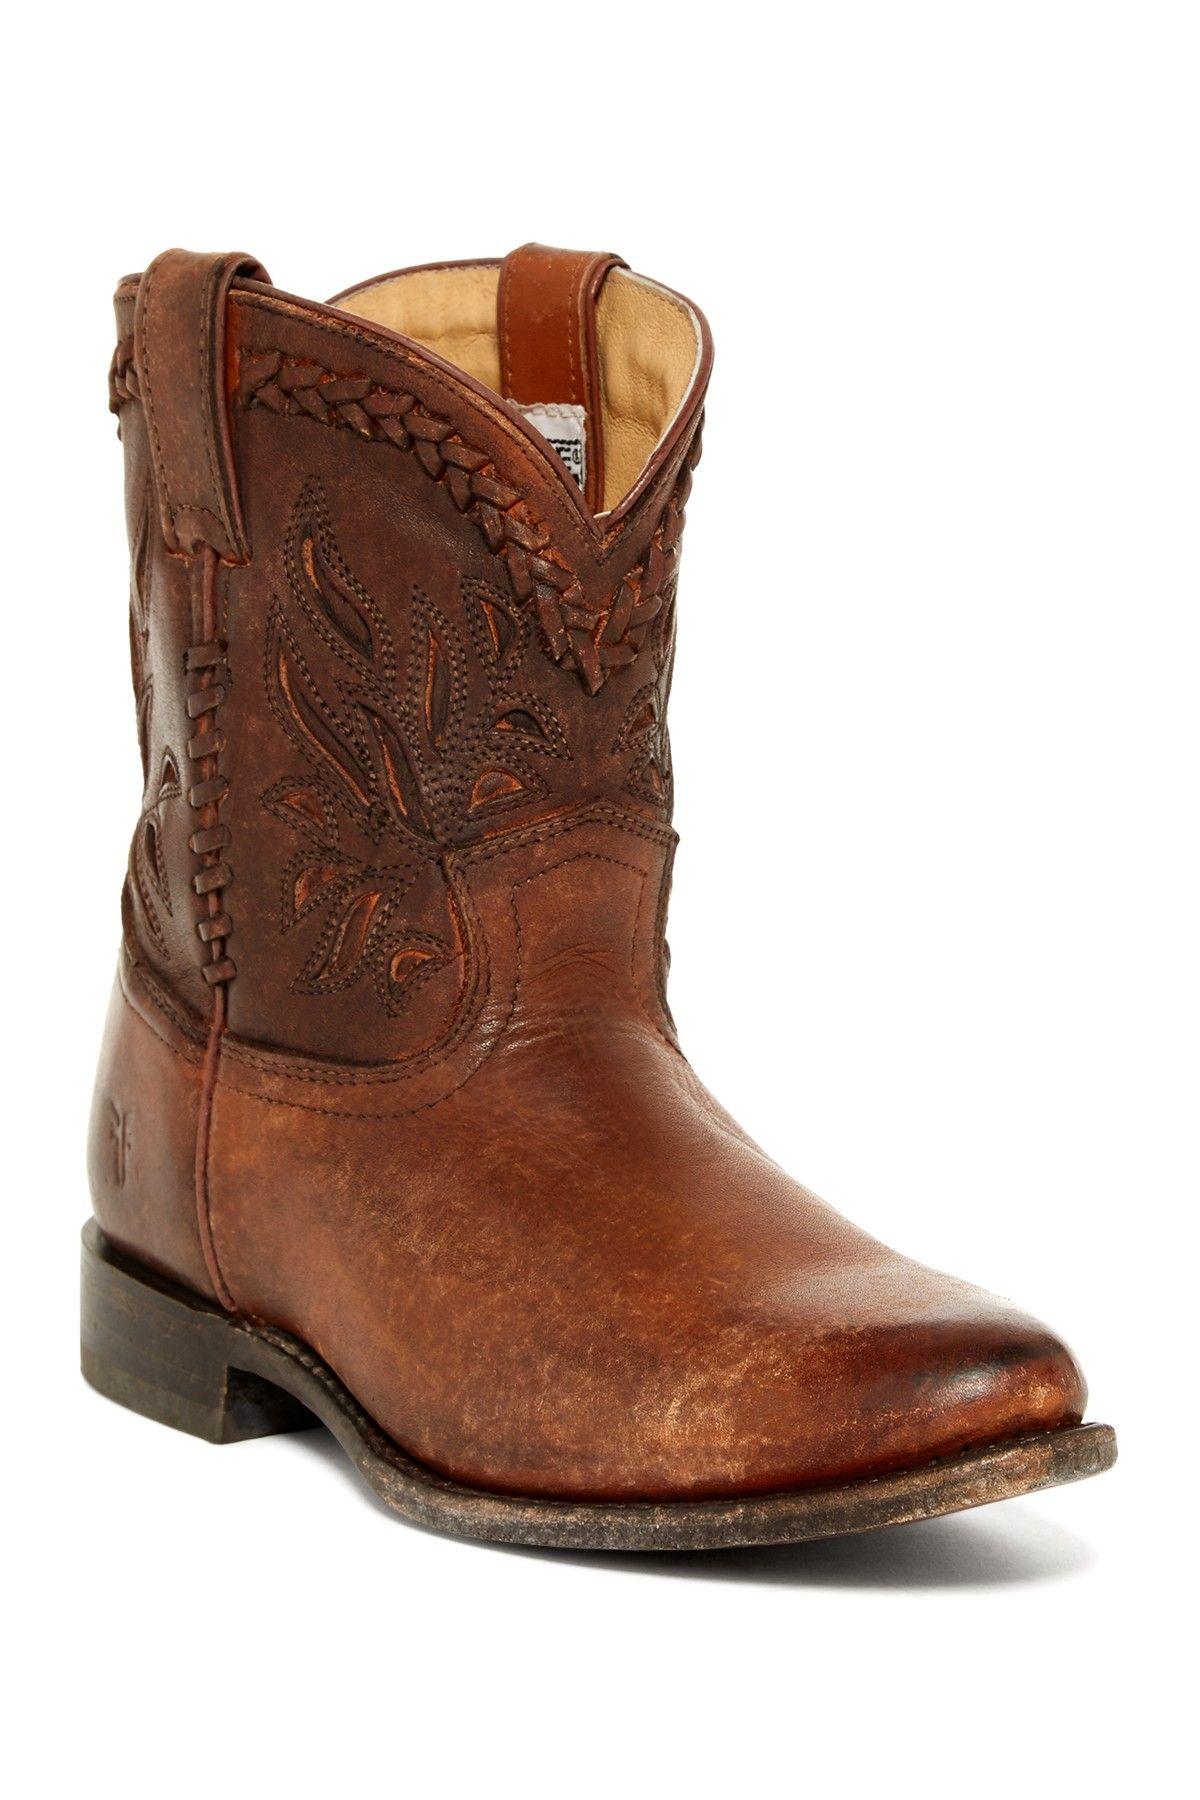 Frye - Wyatt Overlay Short Boot at Nordstrom Rack. Free Shipping on orders over $100.